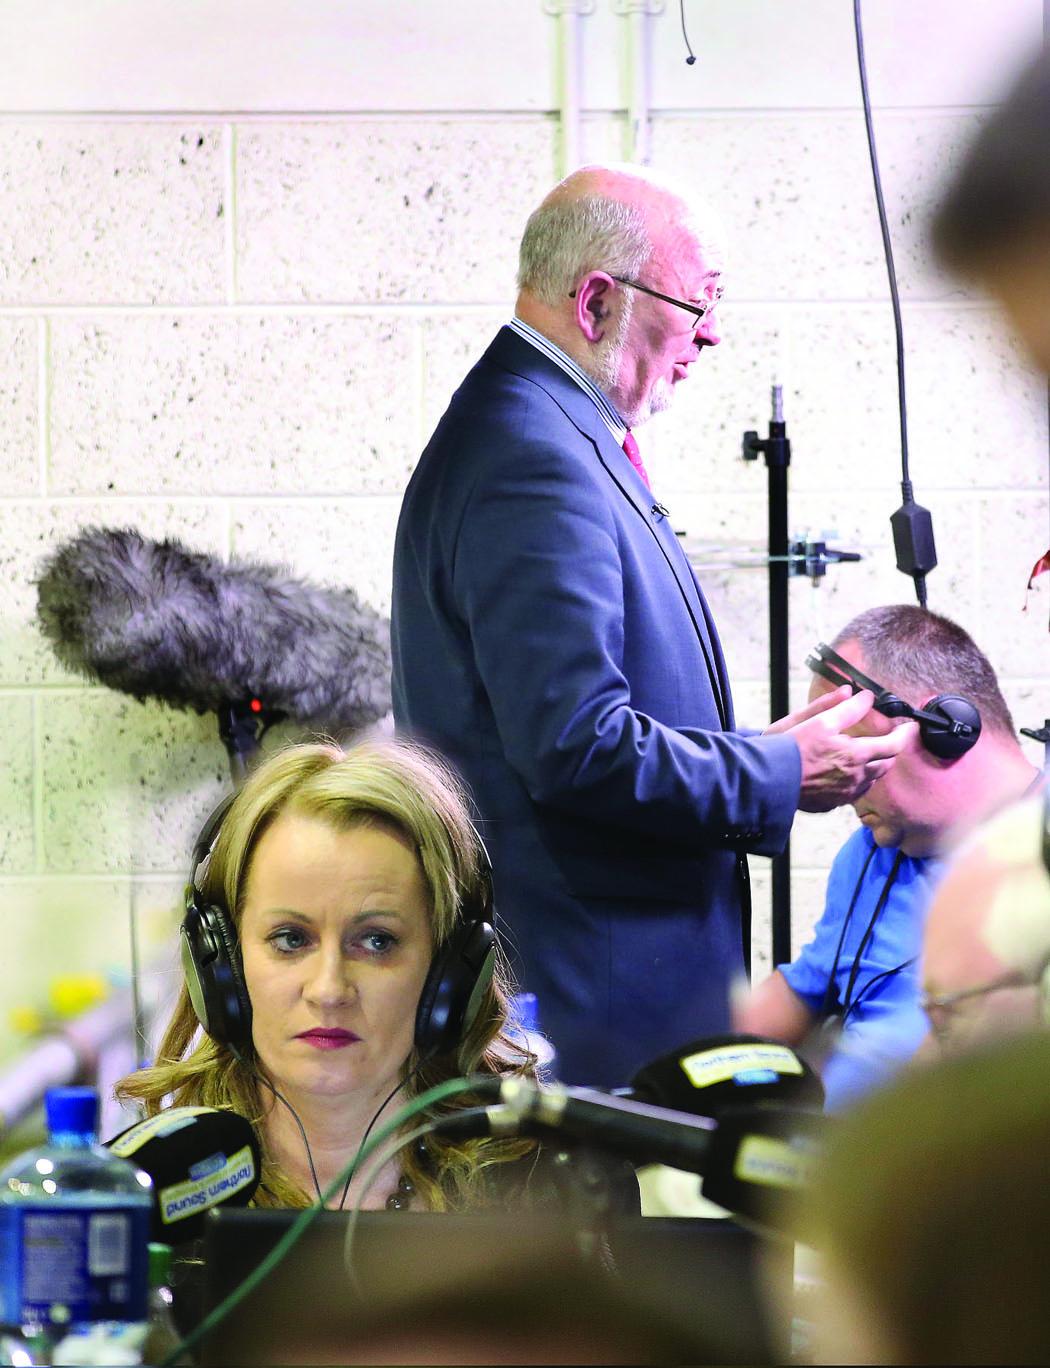 Newly elected TD's Caoimhghín Ó Caoláin and Niamh Smyth giving their first interviews to the Northern Sound and RTÉ, at the Cavan-Monaghan Count Centre on Sunday evening last.  Pic.  Pat Byrne.